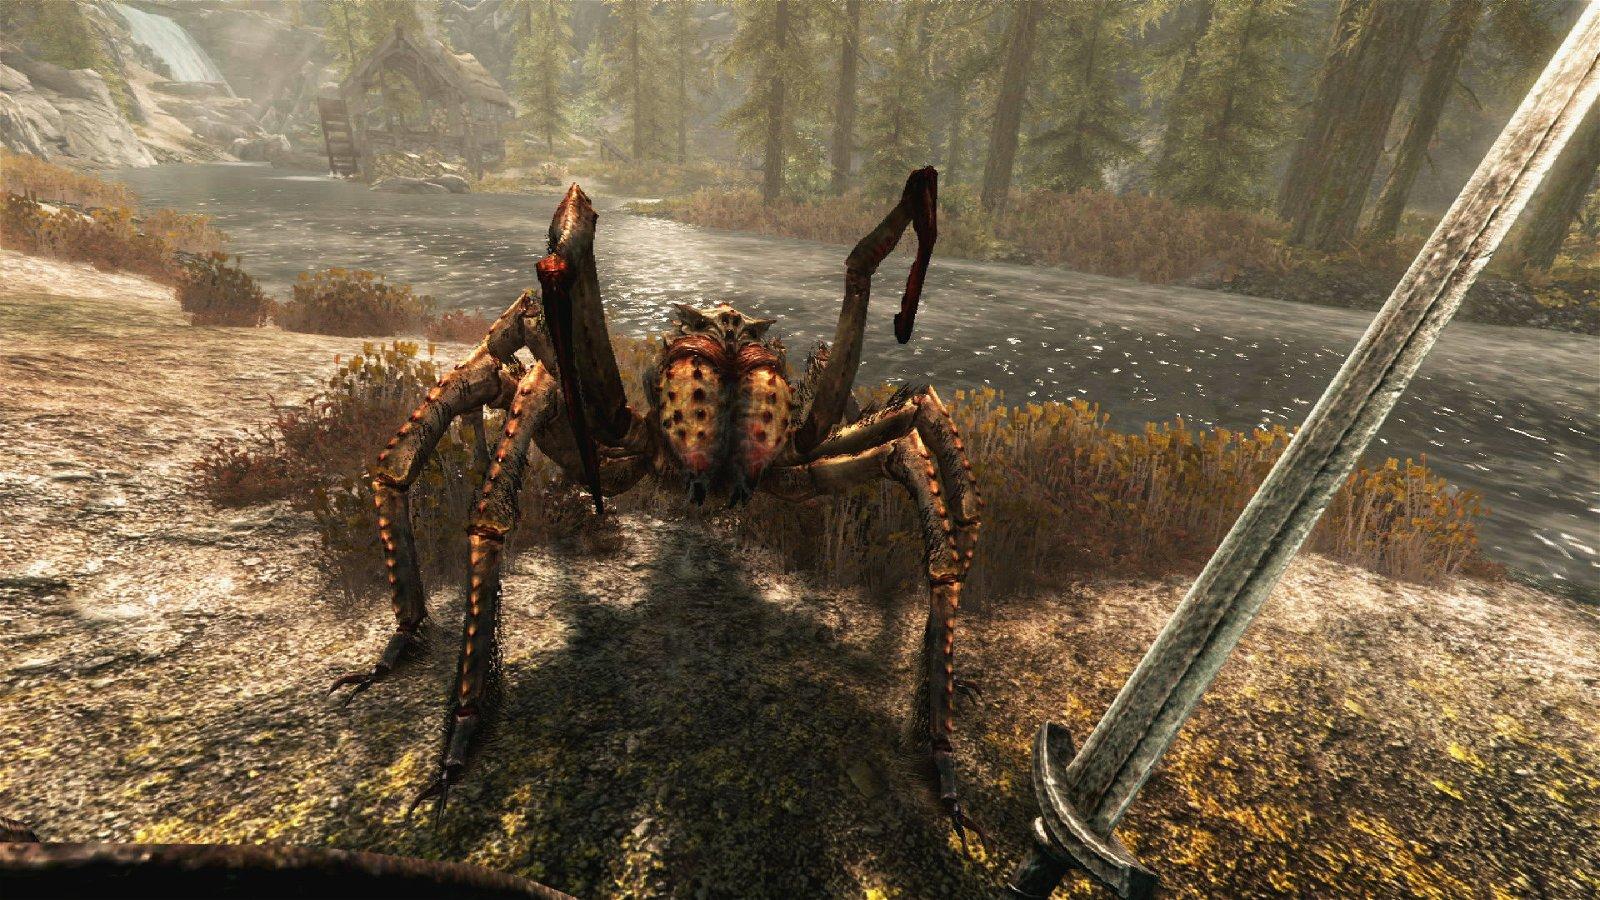 The Elder Scrolls V: Skyrim VR Review: Fresh Ideas, Bad Controls 2